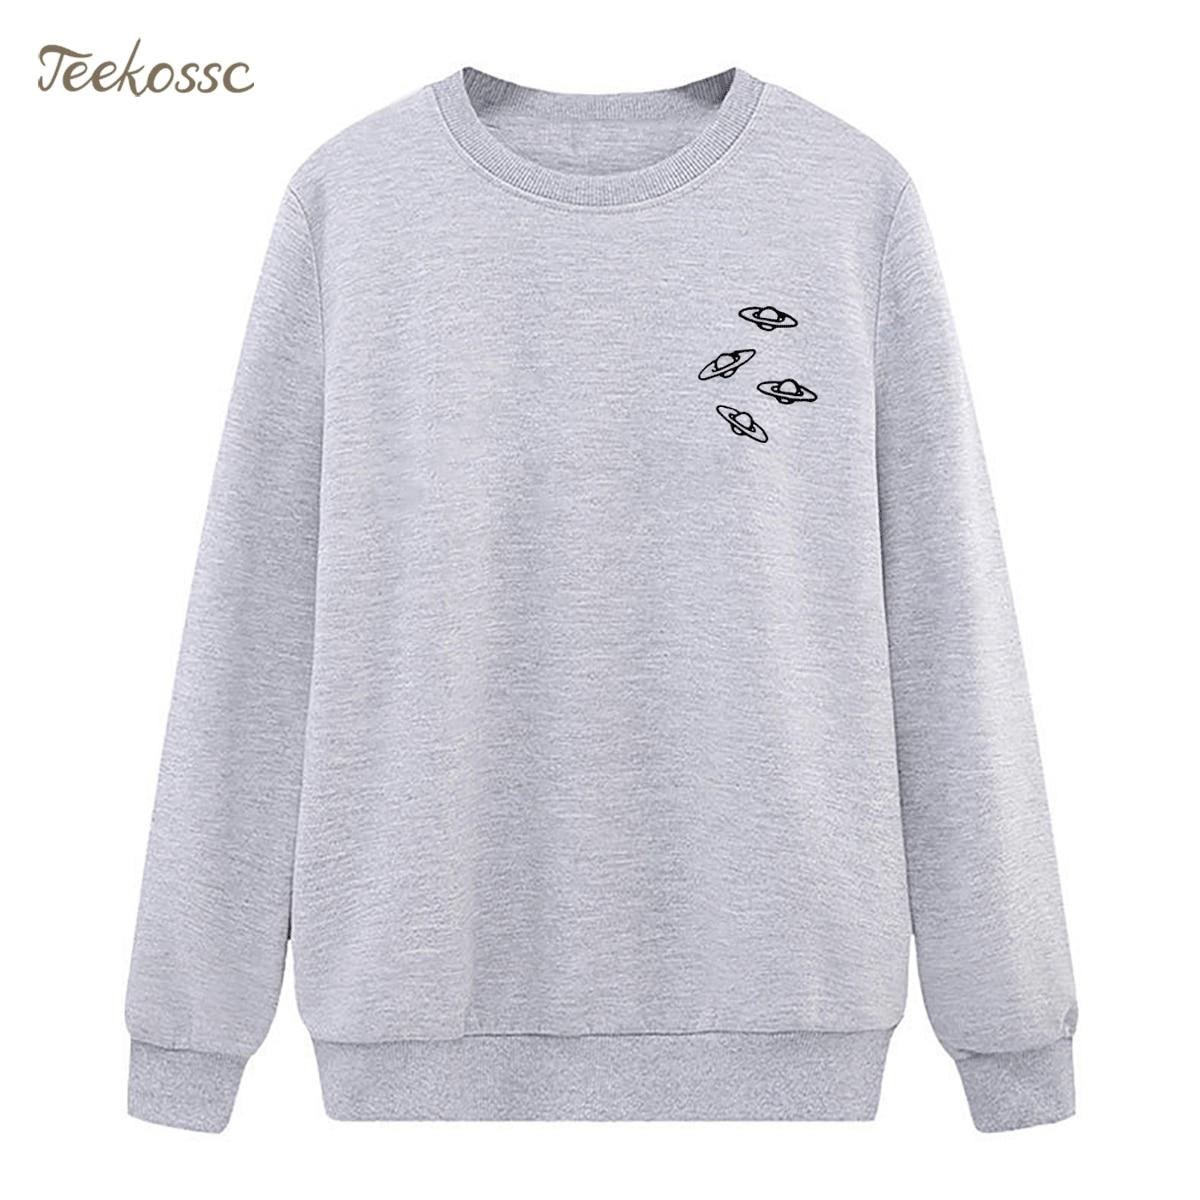 Alien UFO Sweatshirt Harajuku Hoodie 2018 New Winter Autumn Women Lasdies Pullover Fleece Warm Loose Streetwear Brand Clothing